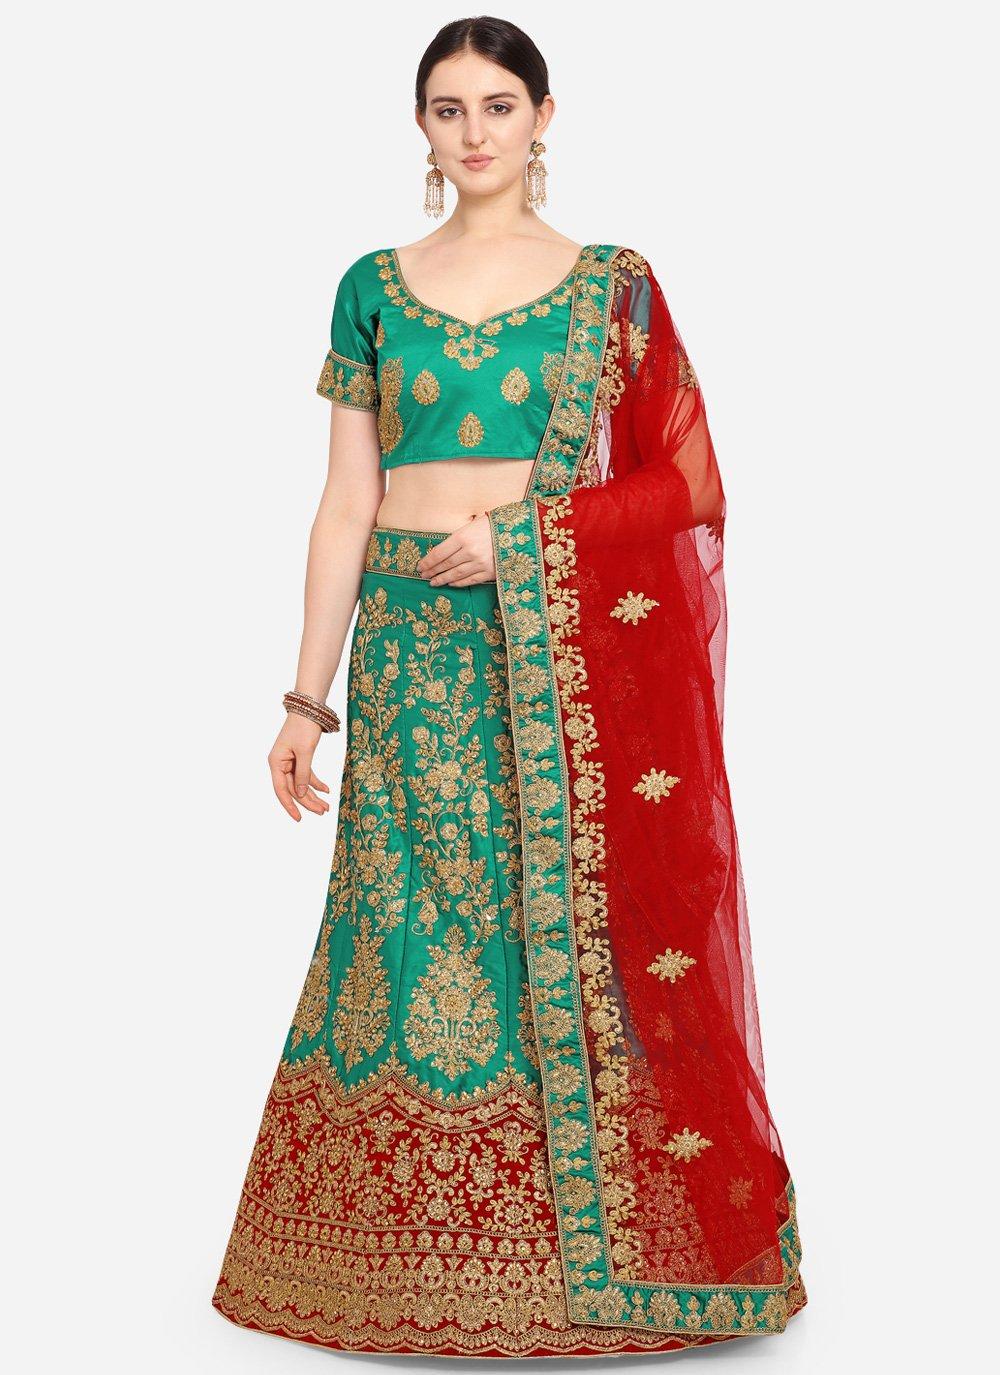 Green Embroidered Satin Bollywood Lehenga Choli